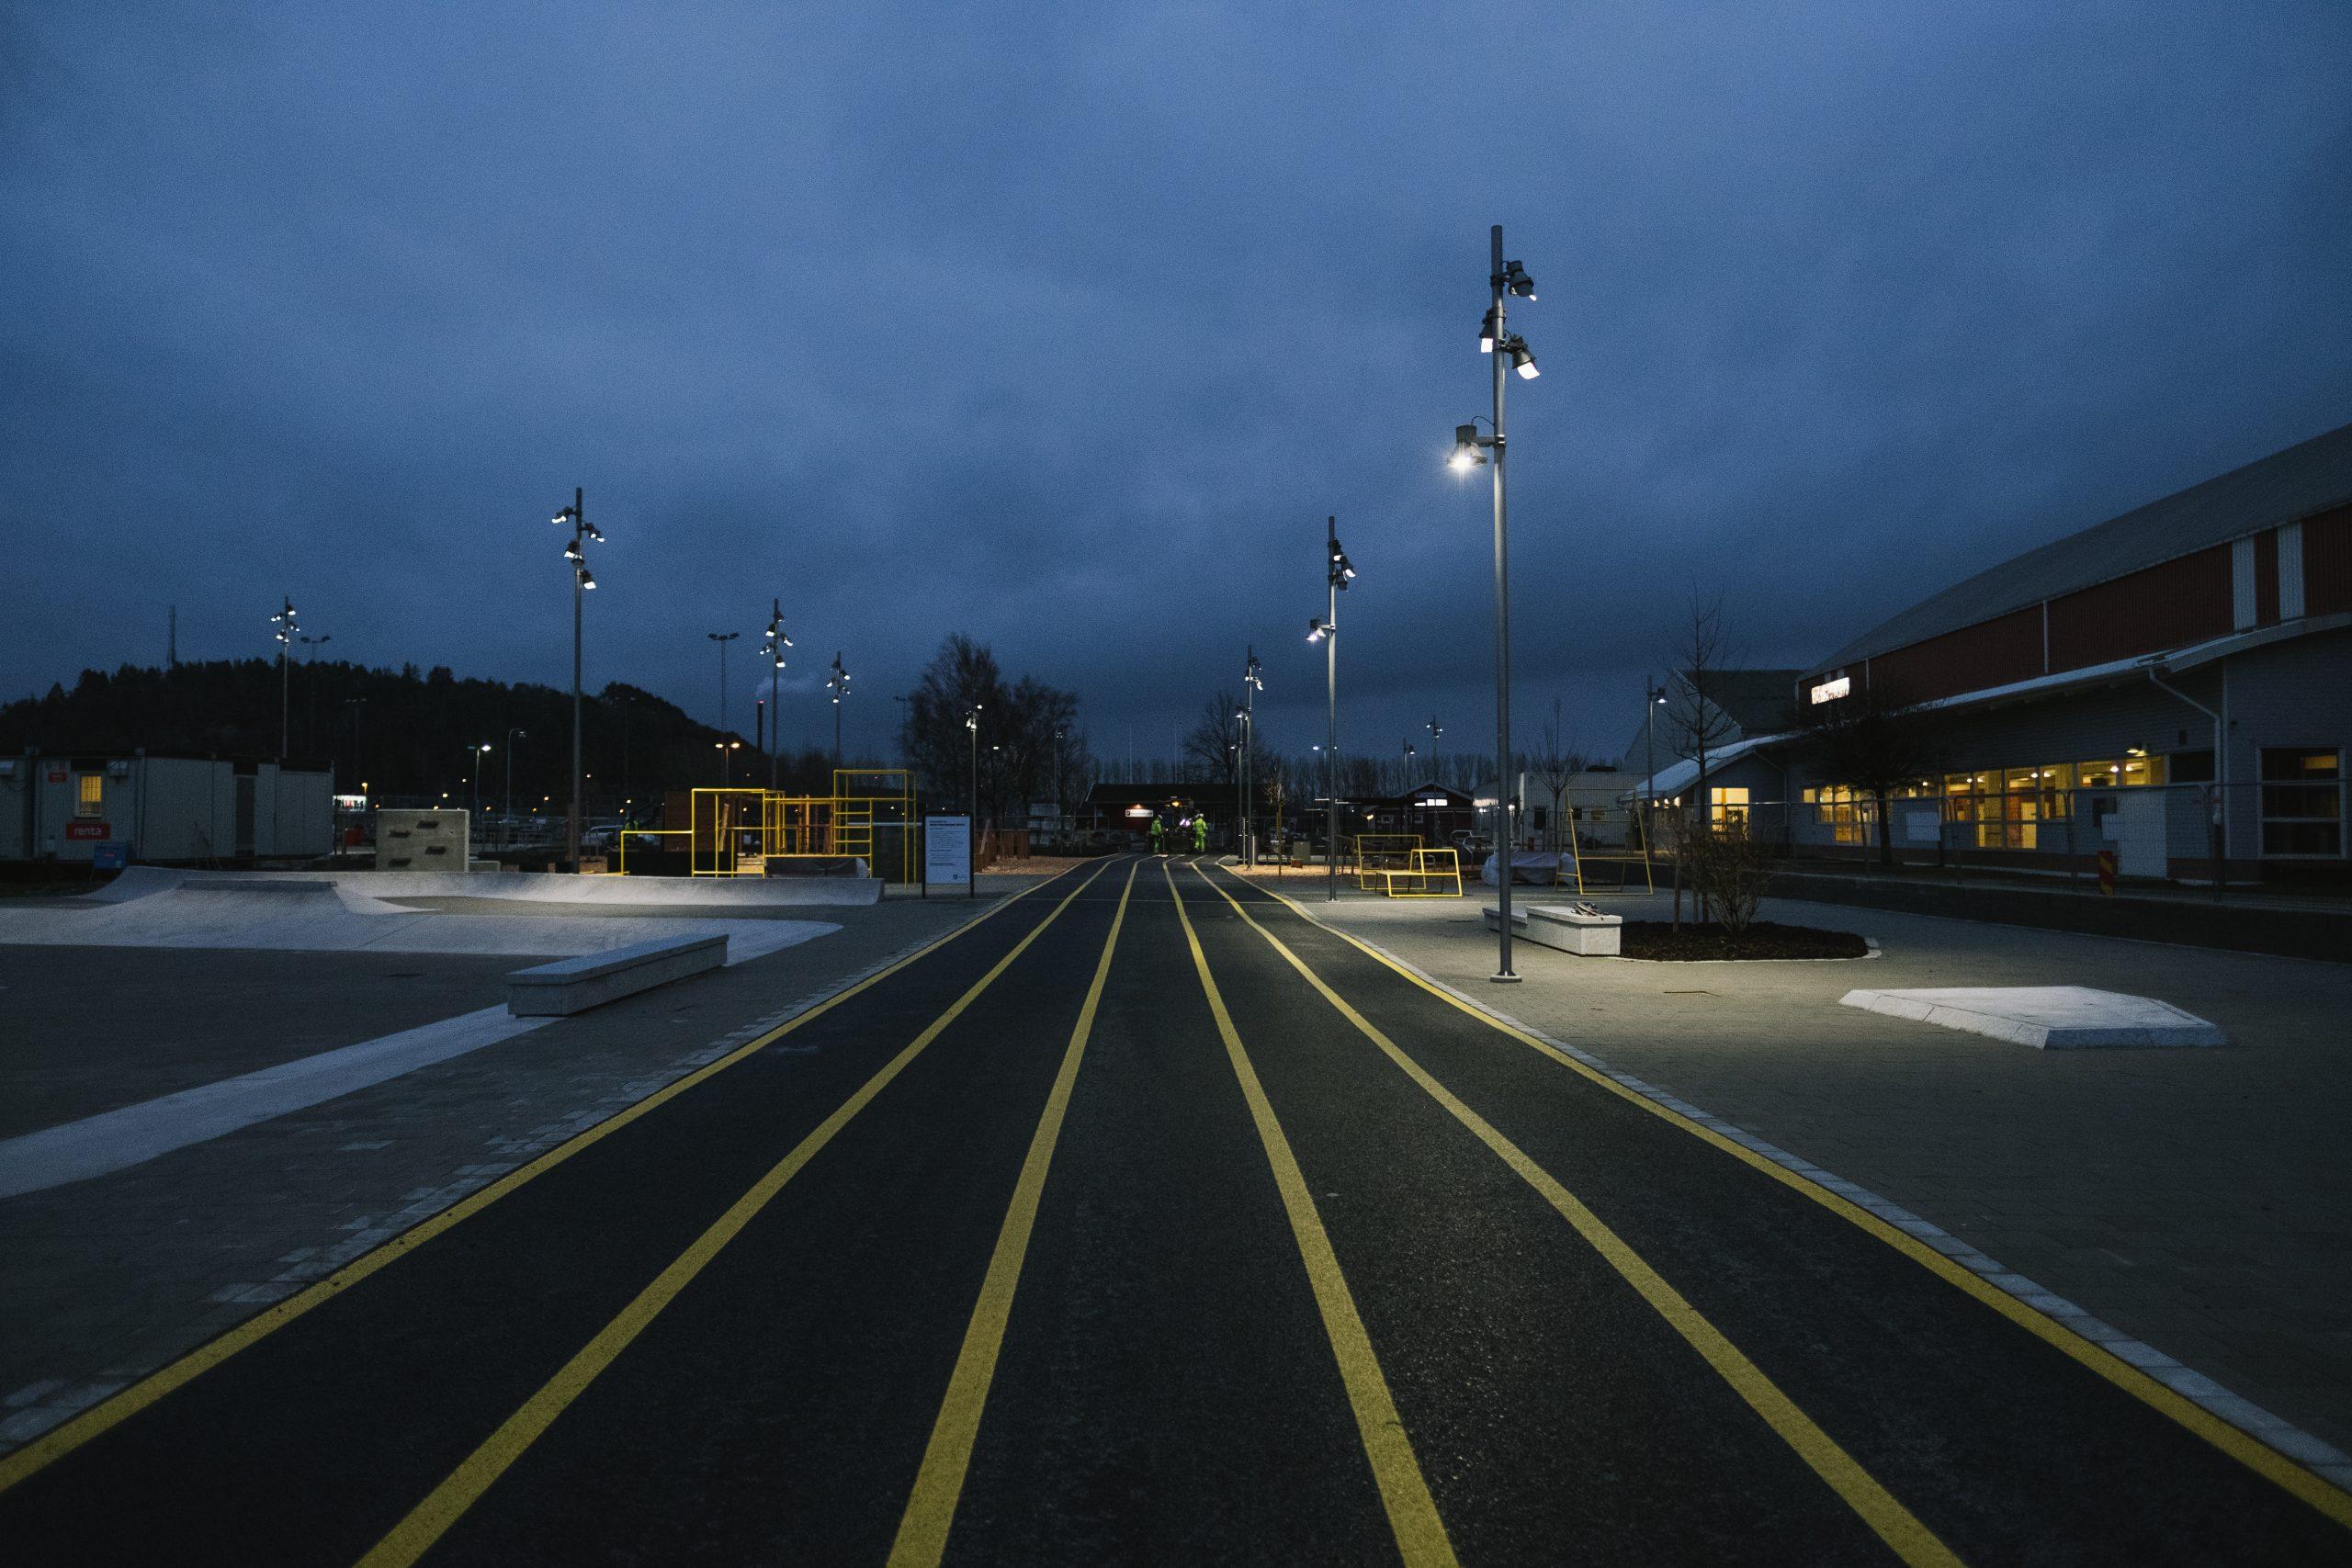 kungsbacka aktivitetspark by night